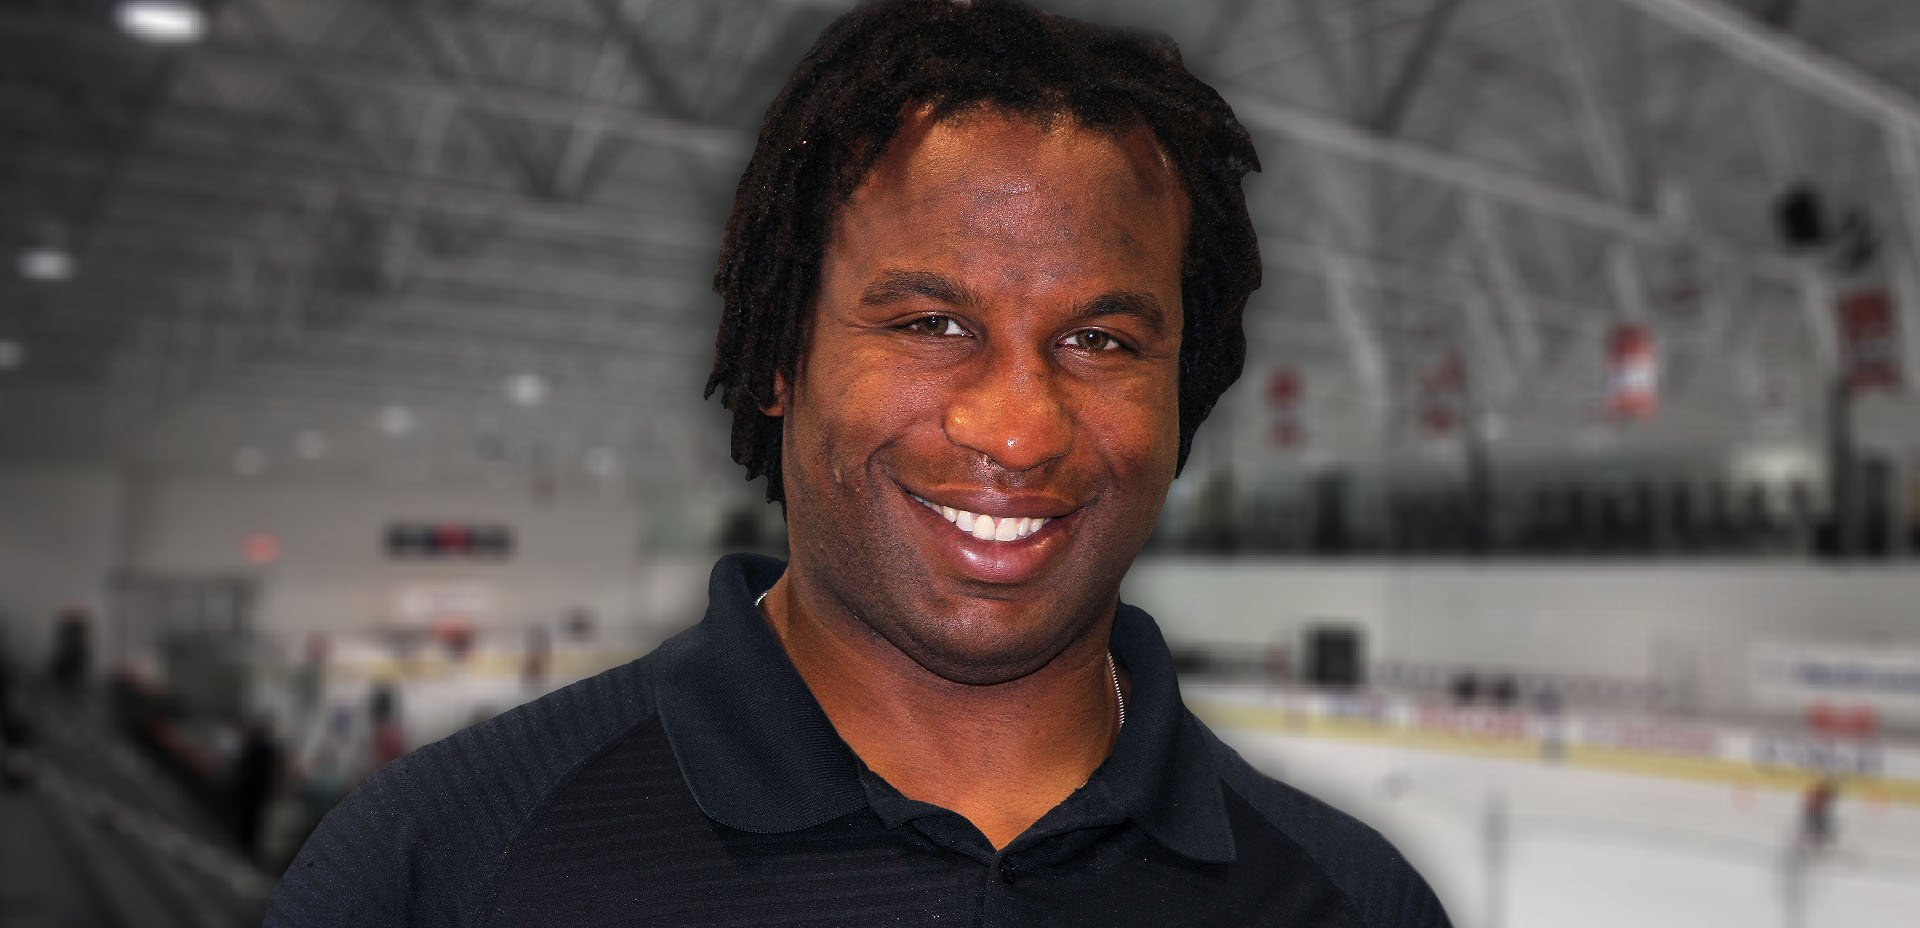 Georges Laraque, giocatore di hockey sul ghiaccio vegano